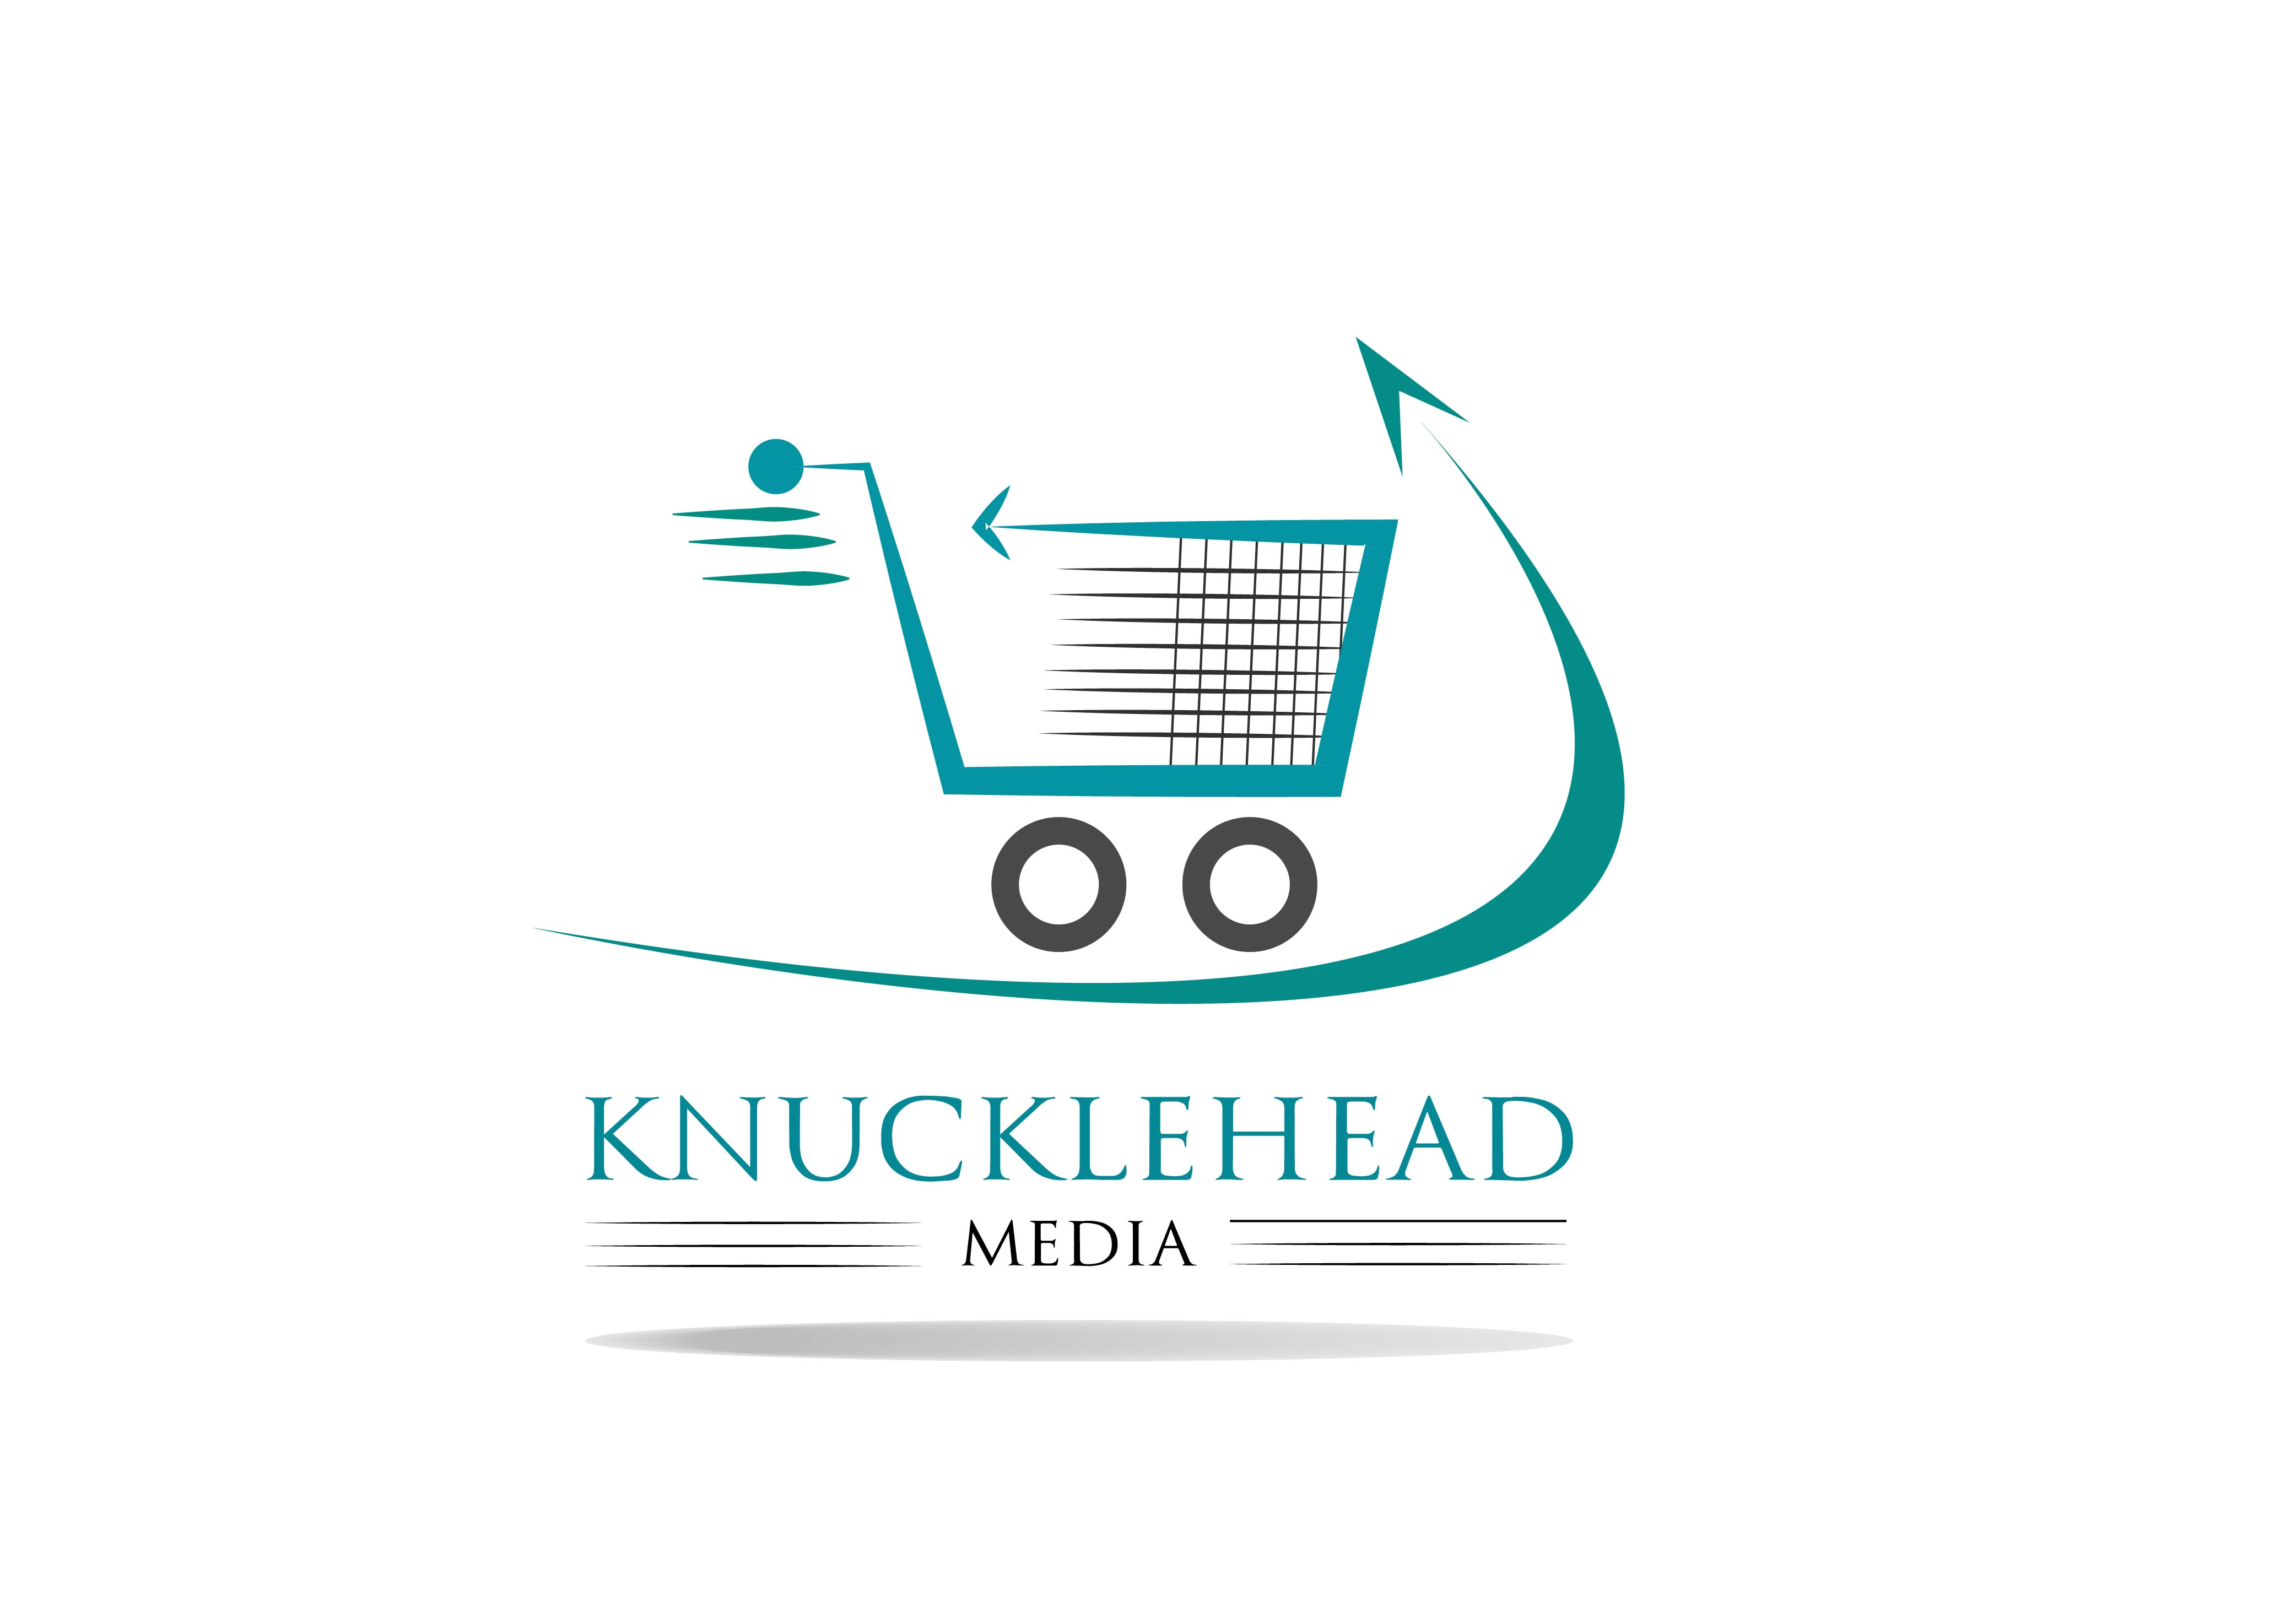 Logo Design by Bilal Baloch - Entry No. 34 in the Logo Design Contest Imaginative Logo Design for knucklehead media.